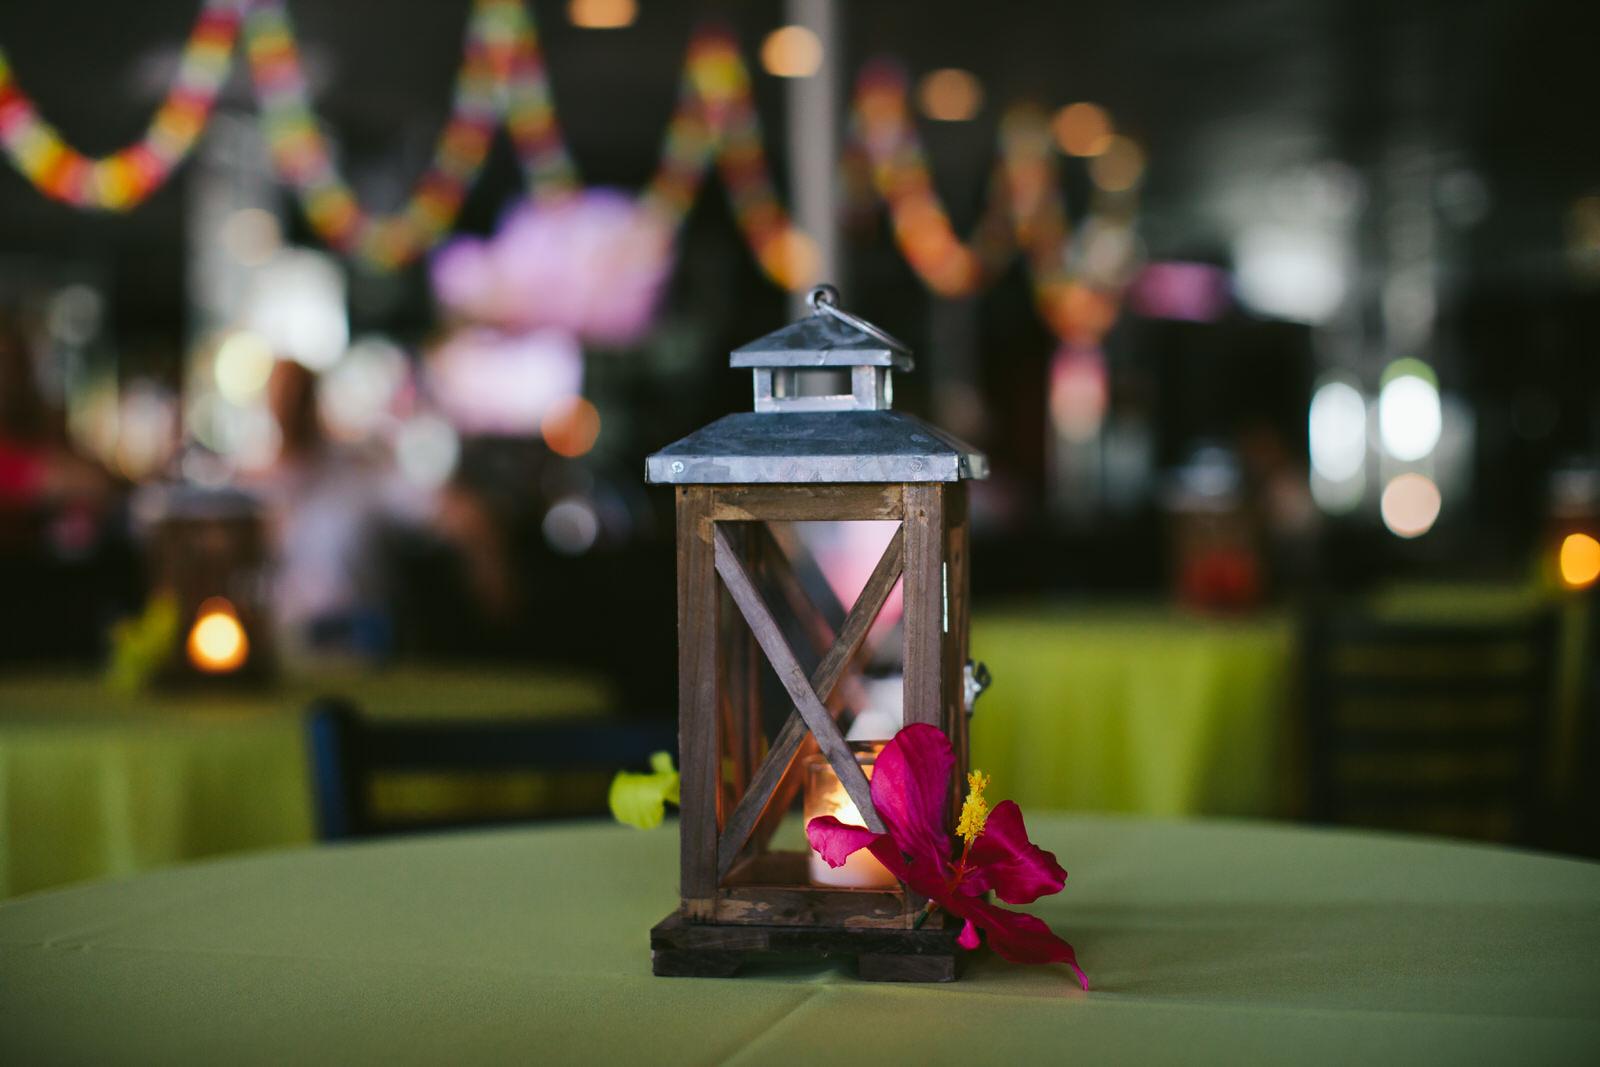 elopement-party-the-pub-wilton-manors-tiny-house-photo-florida-wedding-photographer-8.jpg